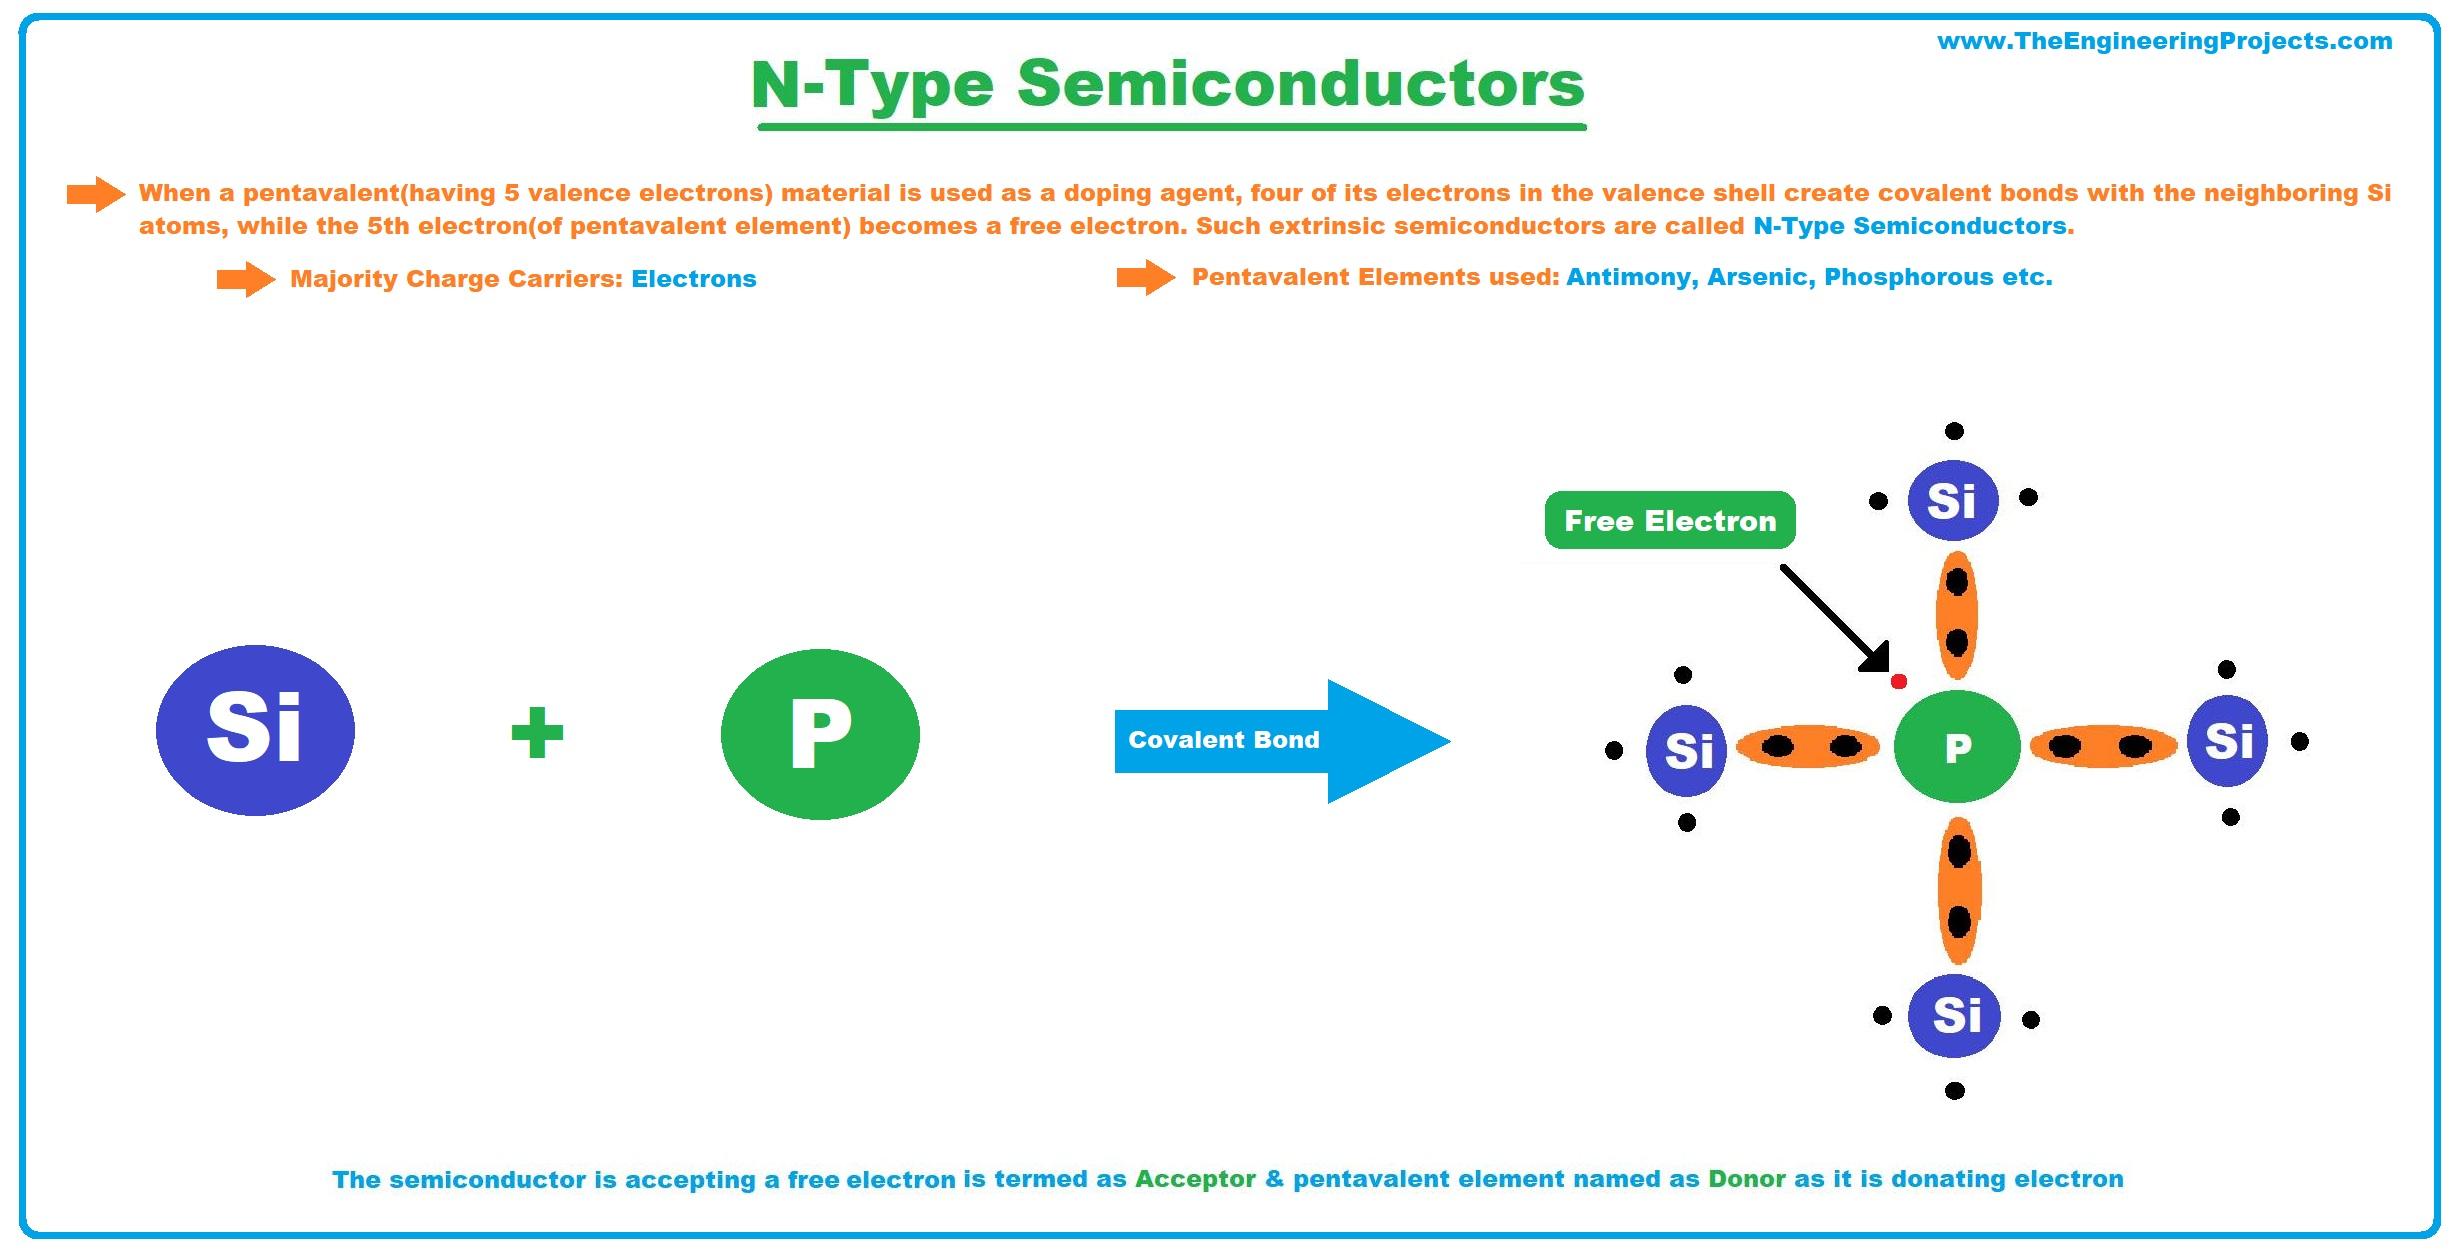 semiconductors, semiconductor, what is semiconductors, types of semiconductors, n type semiconductors, semiconductor material